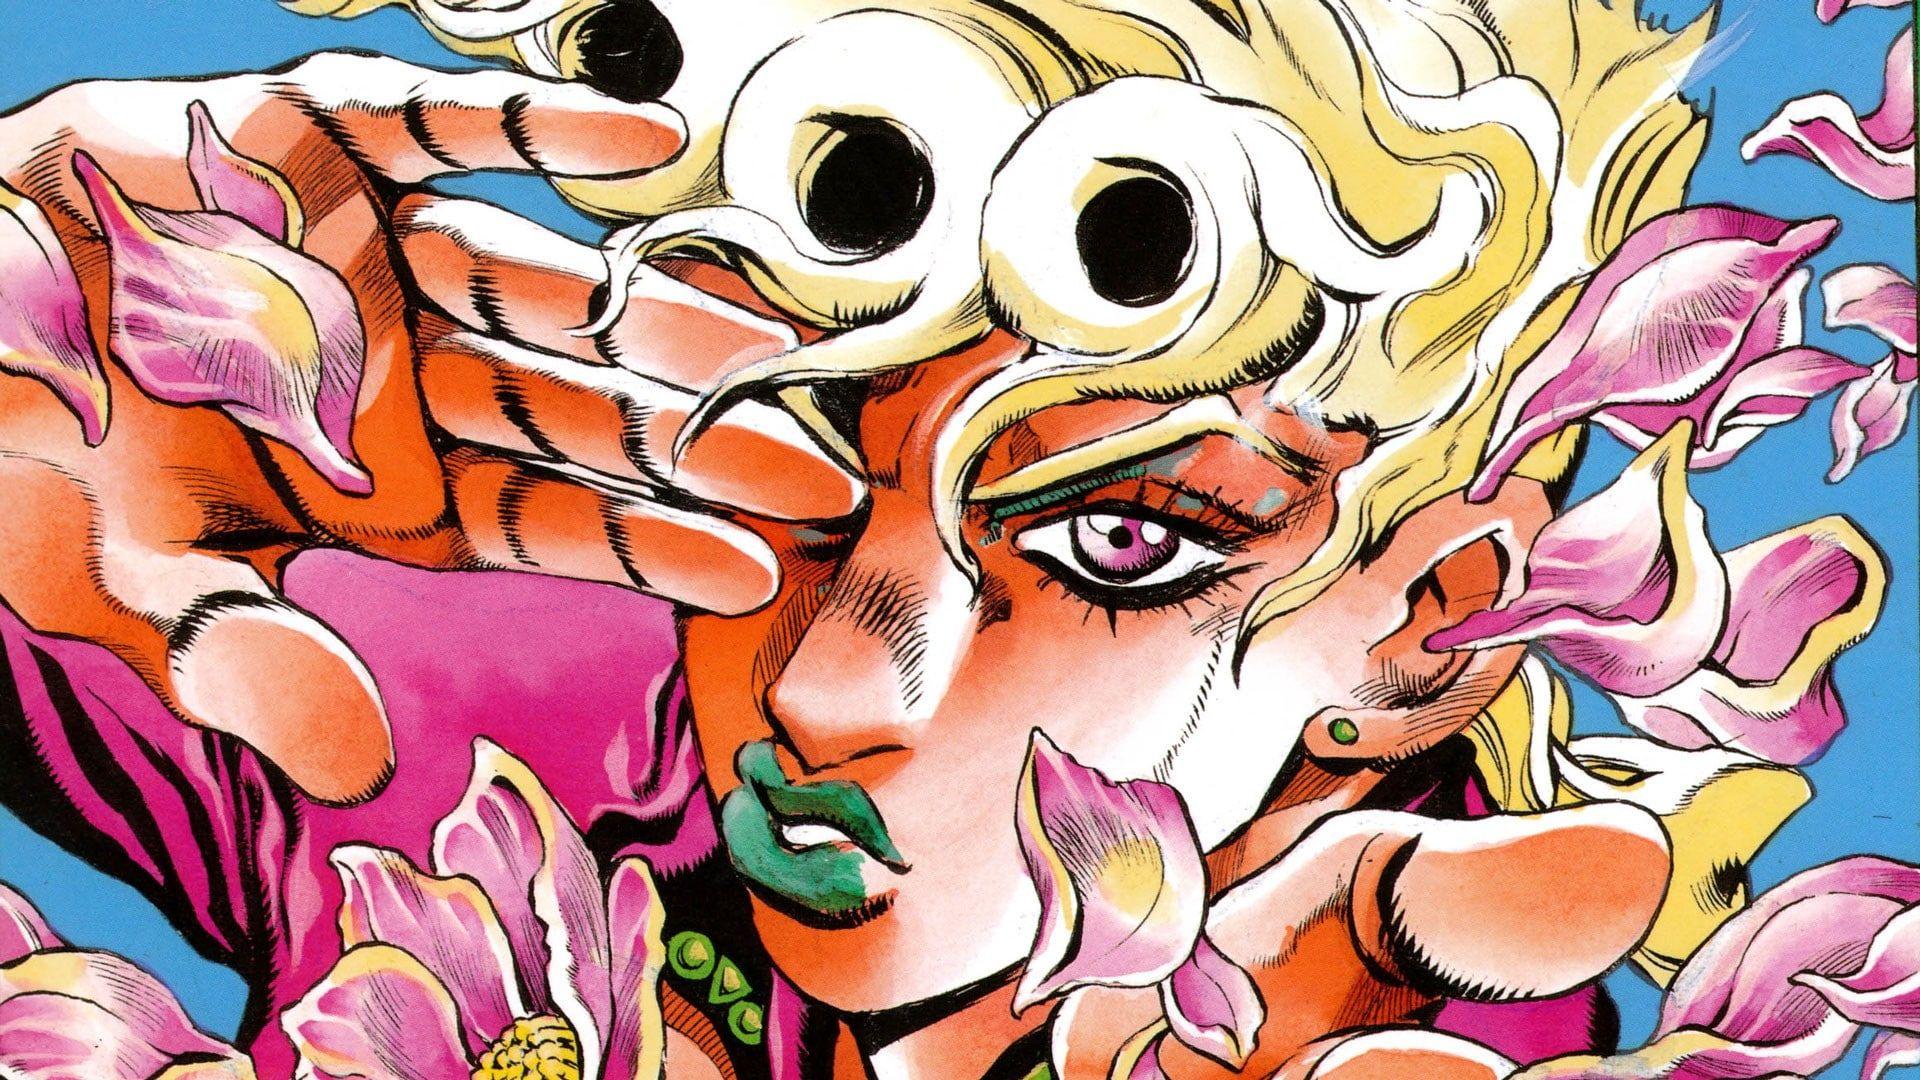 Jojo S Bizarre Adventure Giorno Giovanna Manga Giogio 1080p Wallpaper Hdwallpaper Desktop Jojo Bizarre Jojo S Bizarre Adventure Jojo Bizzare Adventure